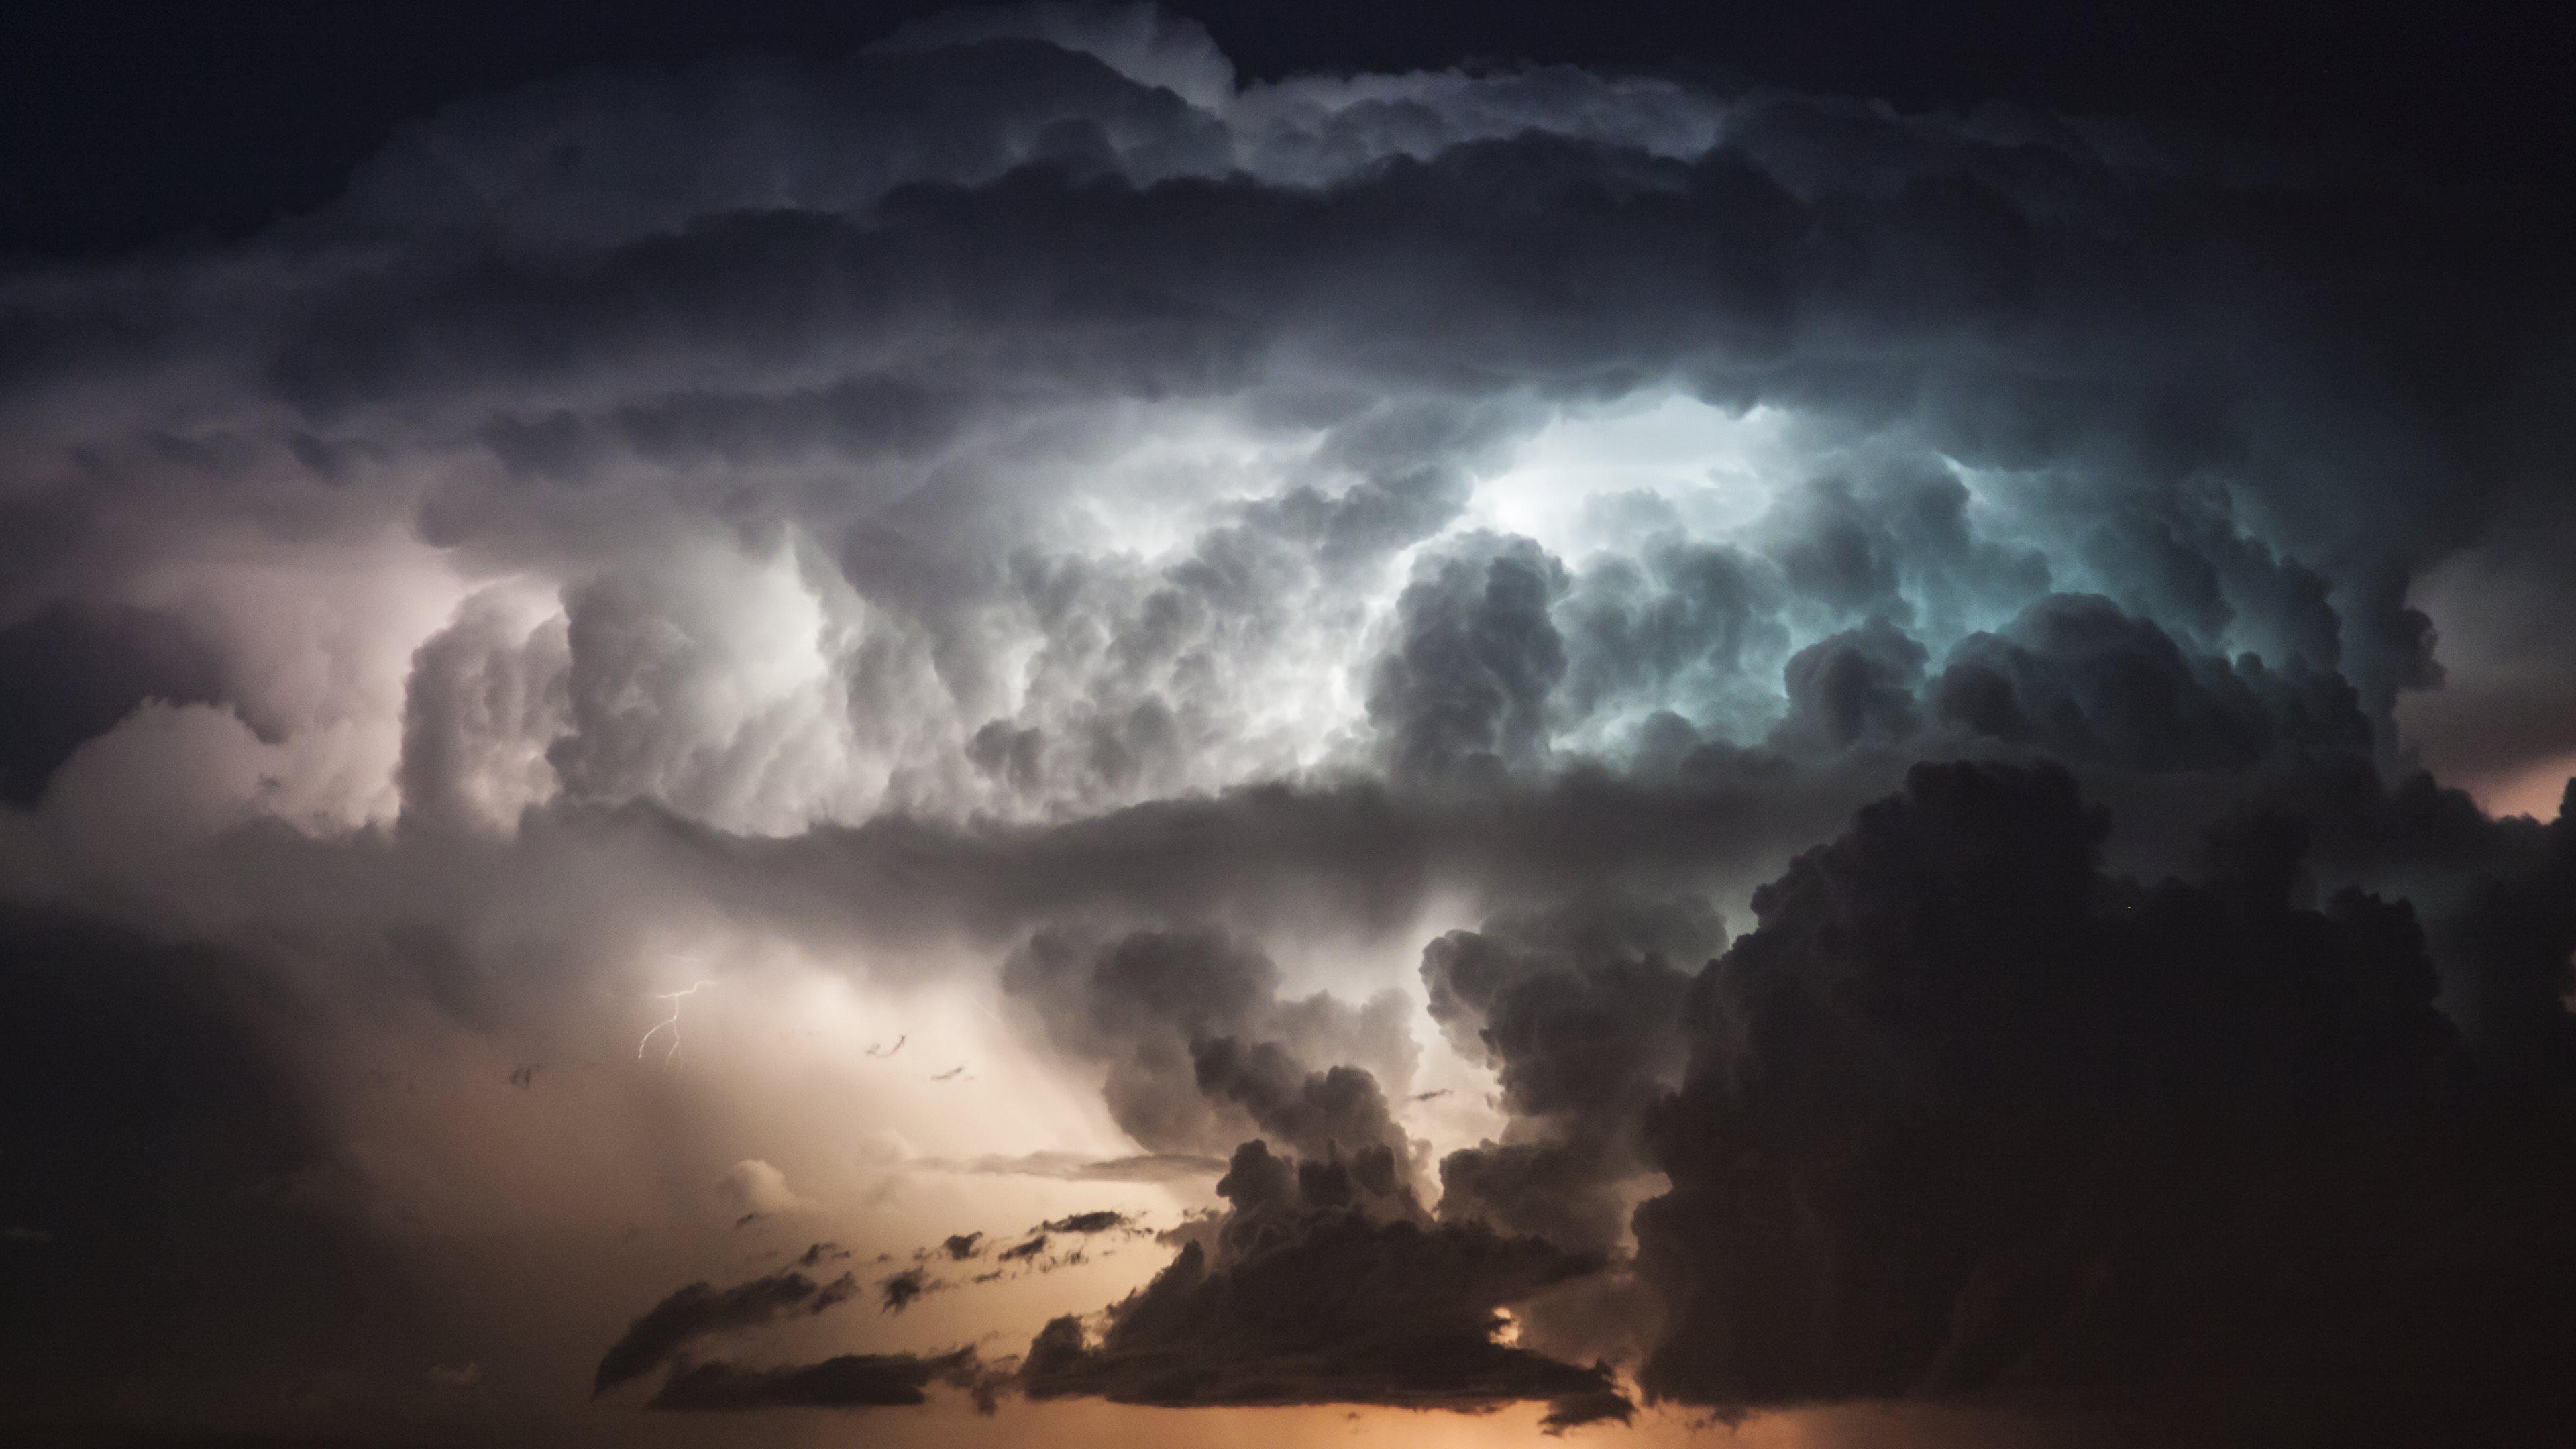 Thunderstorm Wallpapers · 4K HD Desktop Backgrounds Phone Images